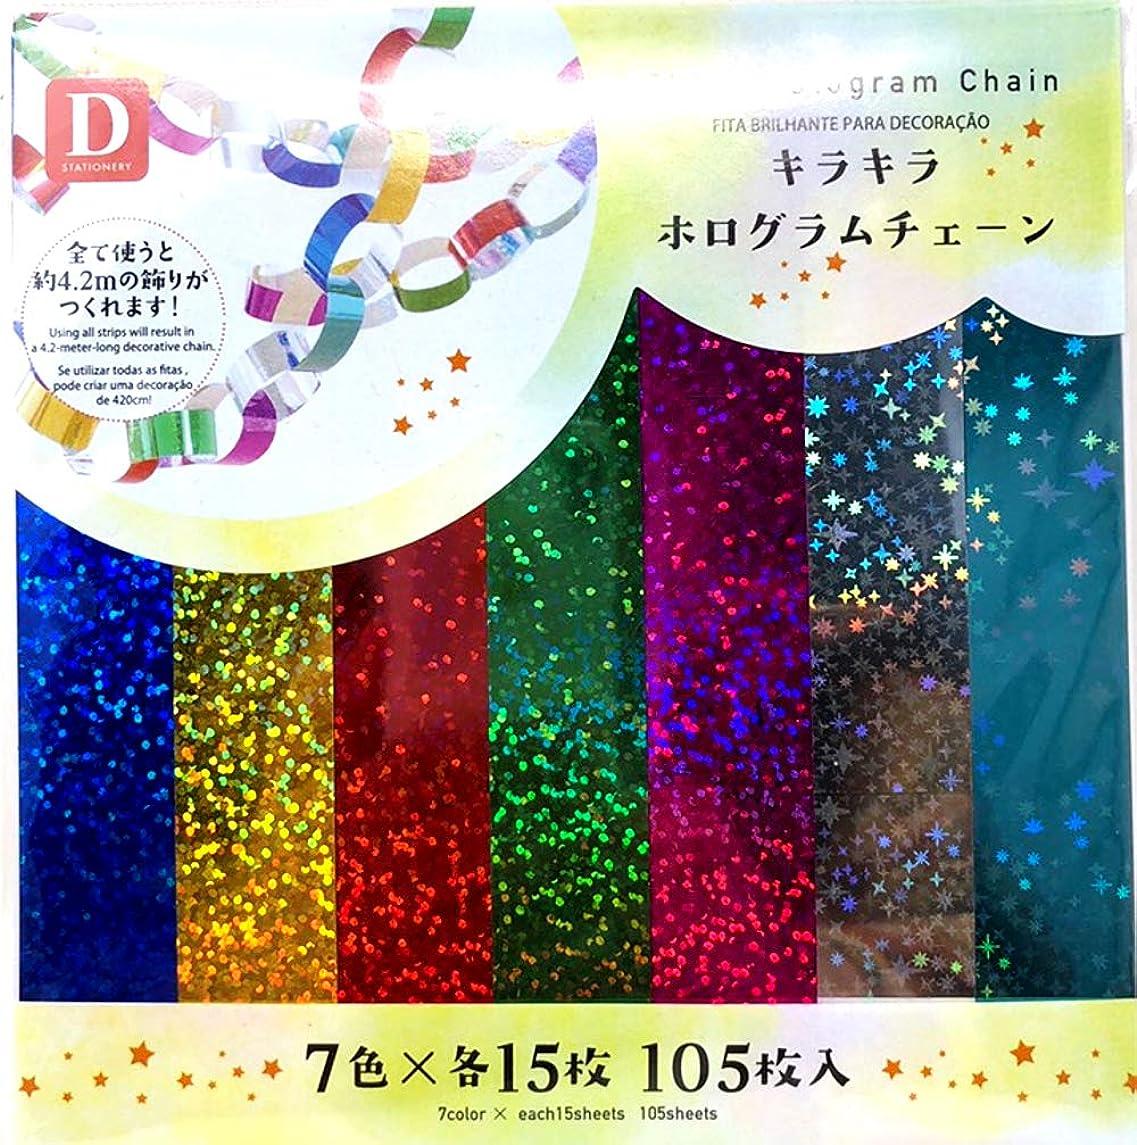 105 PCS Shiny Hologram Design Paper Chain Strips, Scarpbooks, Arts & Crafts, Party Decoration and more